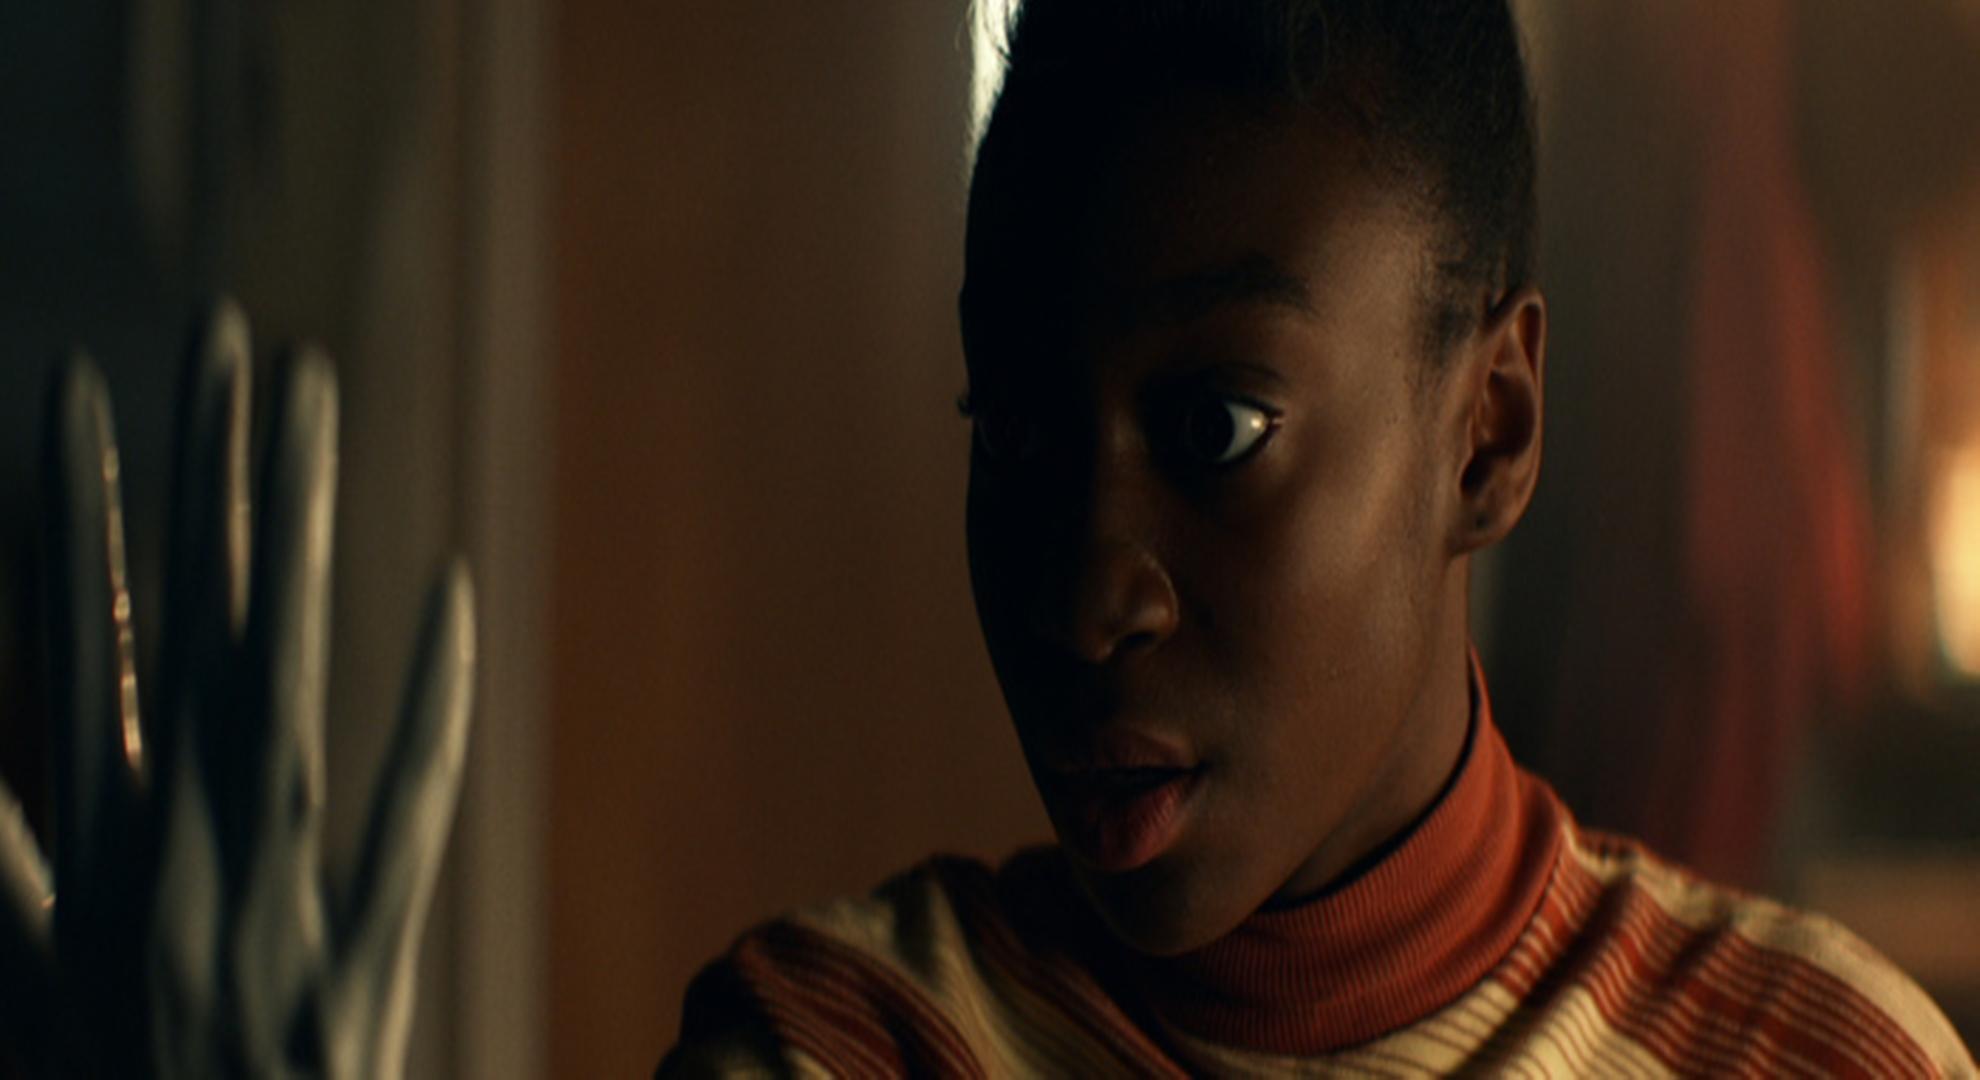 Amazon Prime Video divulga trailer de 'Outros' (Them)